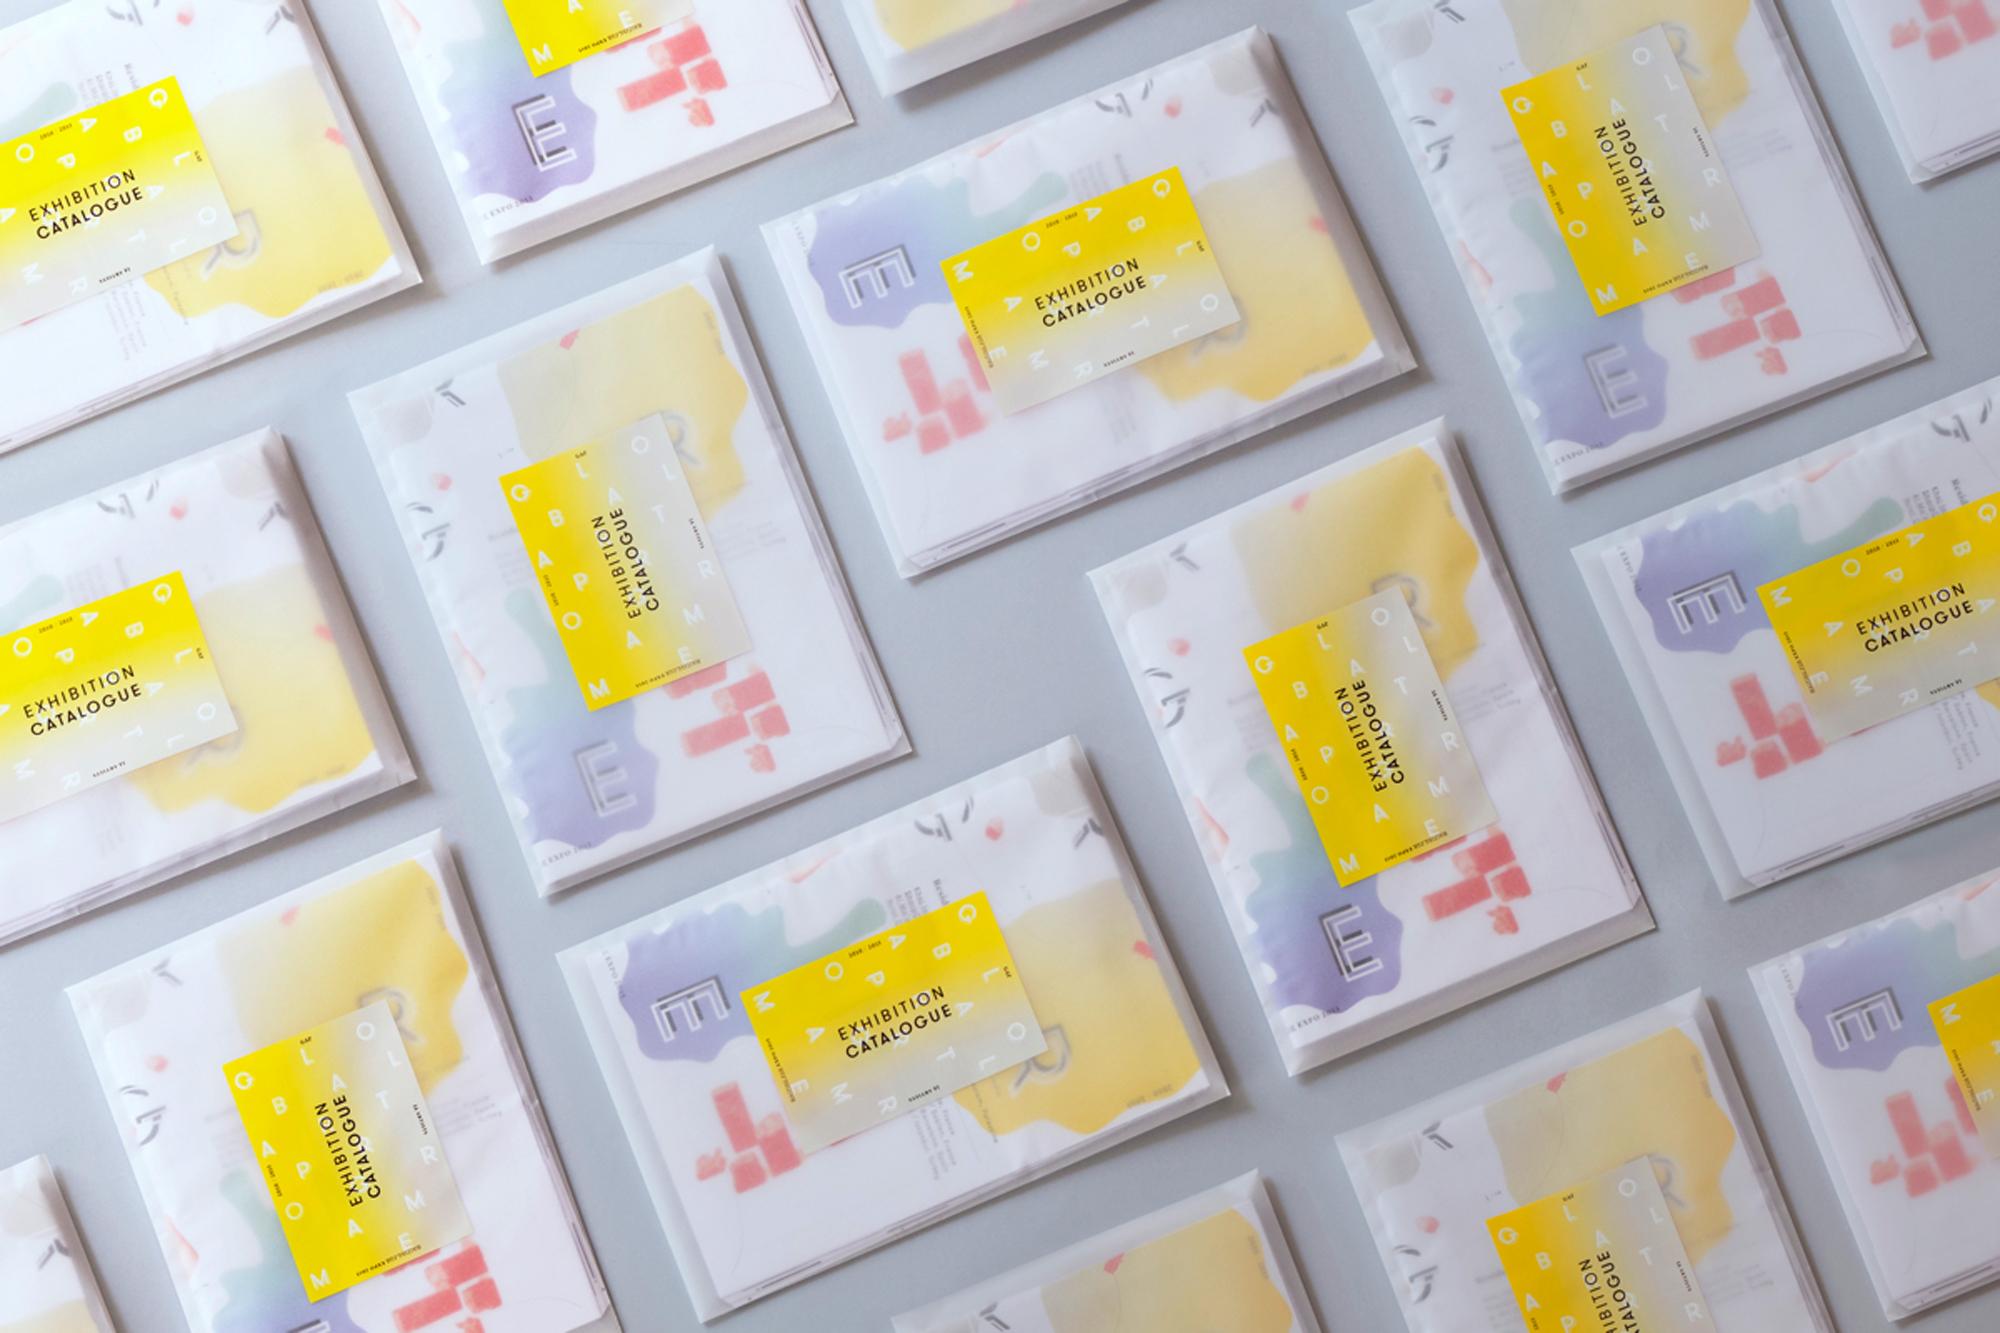 Global Art Programme by Sūqrepubliq - Creative Work